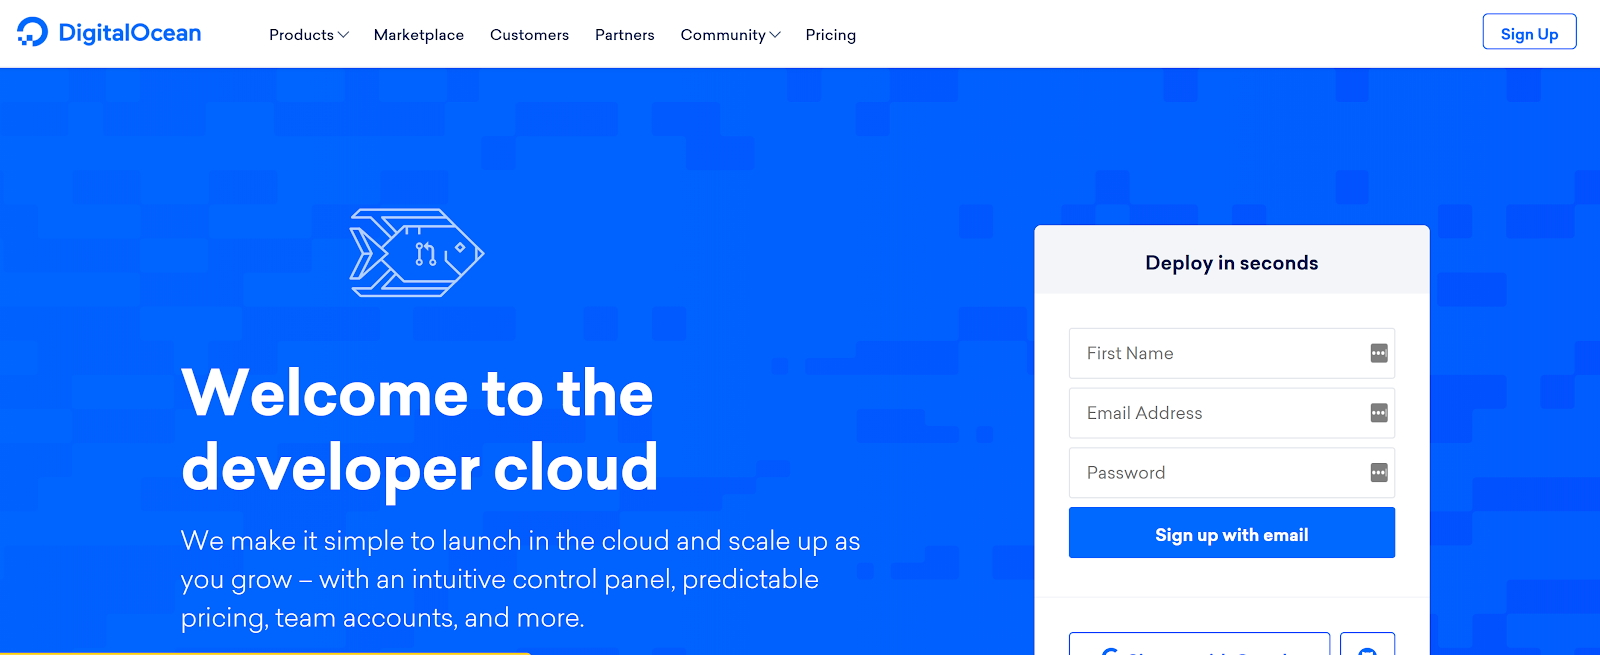 DigitalOcean's website